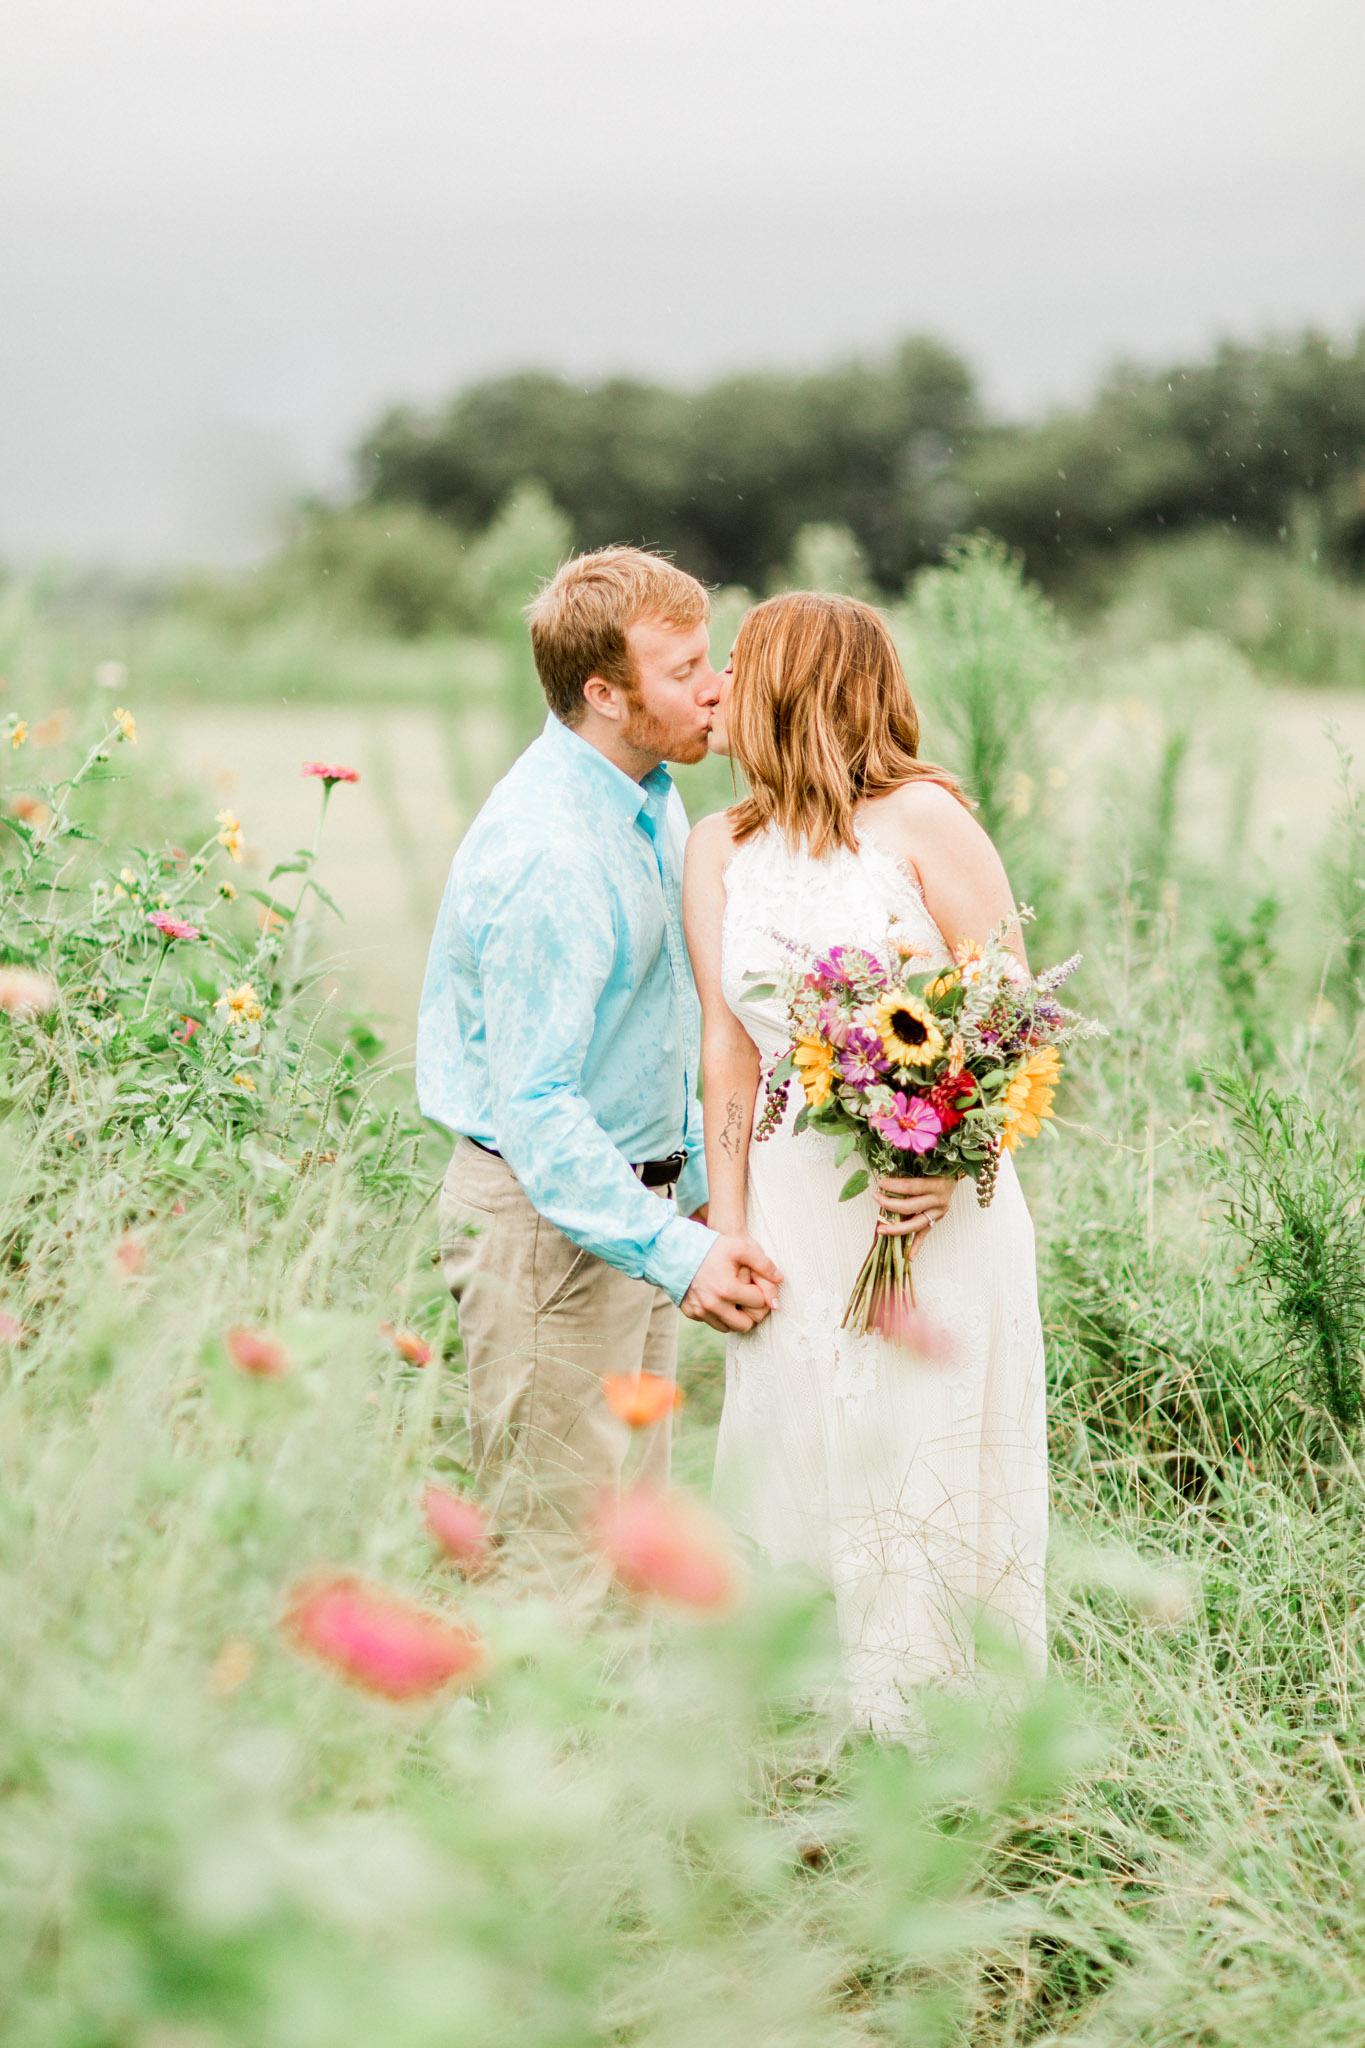 Burkburnett, TX Engagement Photos - Light and Airy Photography